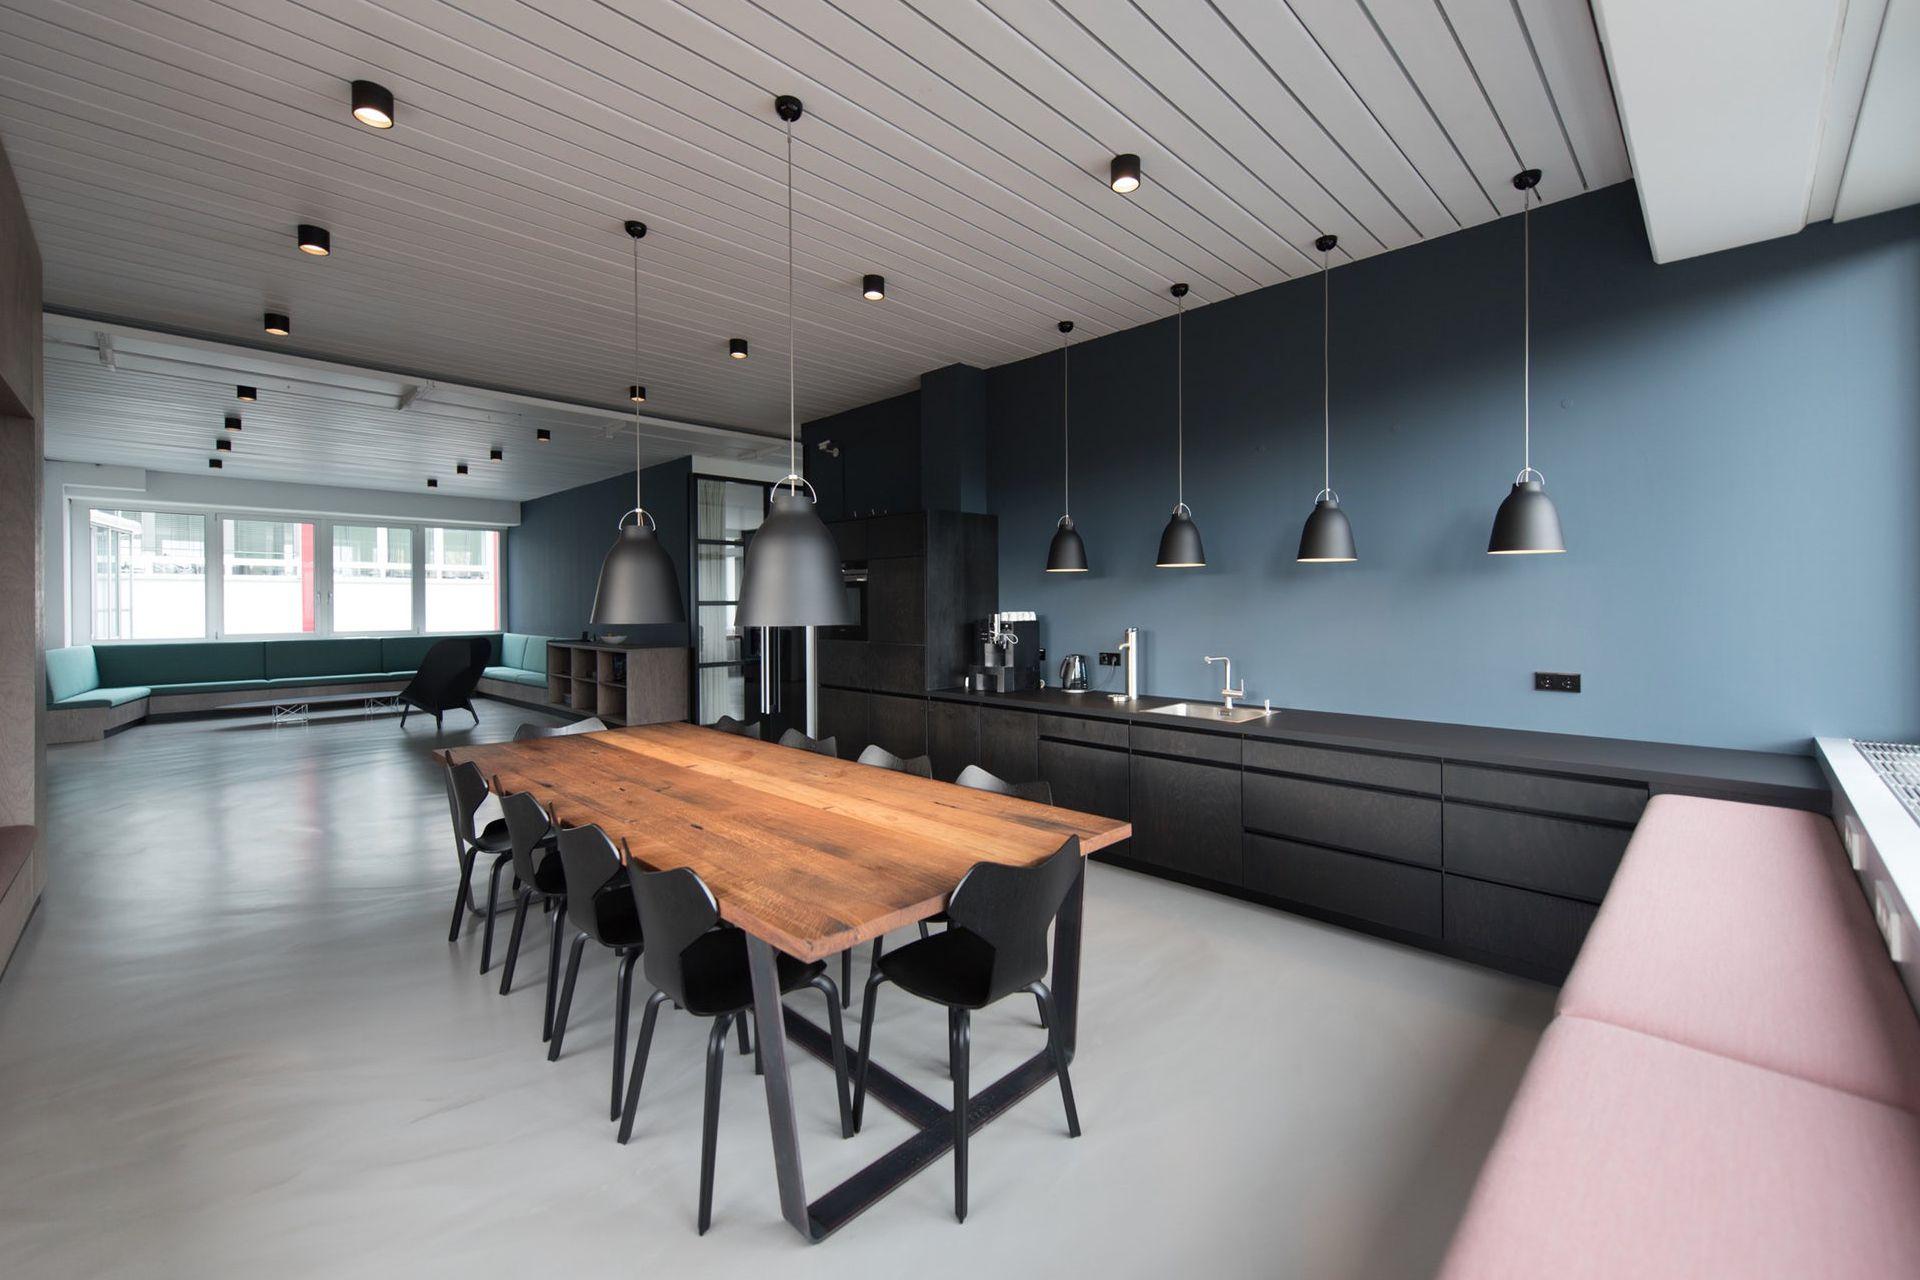 Interiorismo de cocina